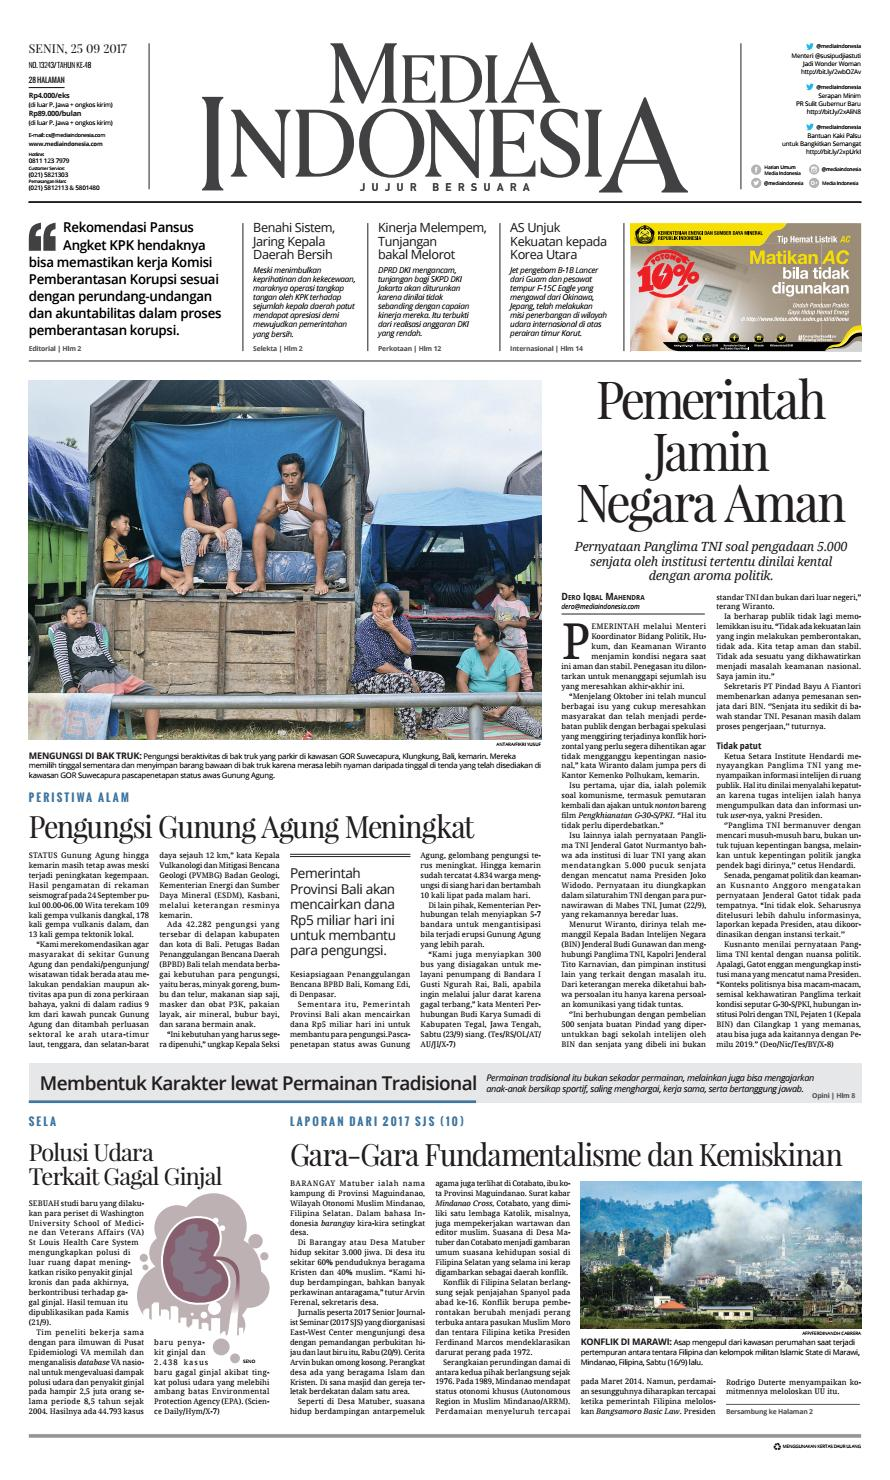 Media indonesia 25 09 2017 25092017030728 by Oppah - issuu 1c6d075011